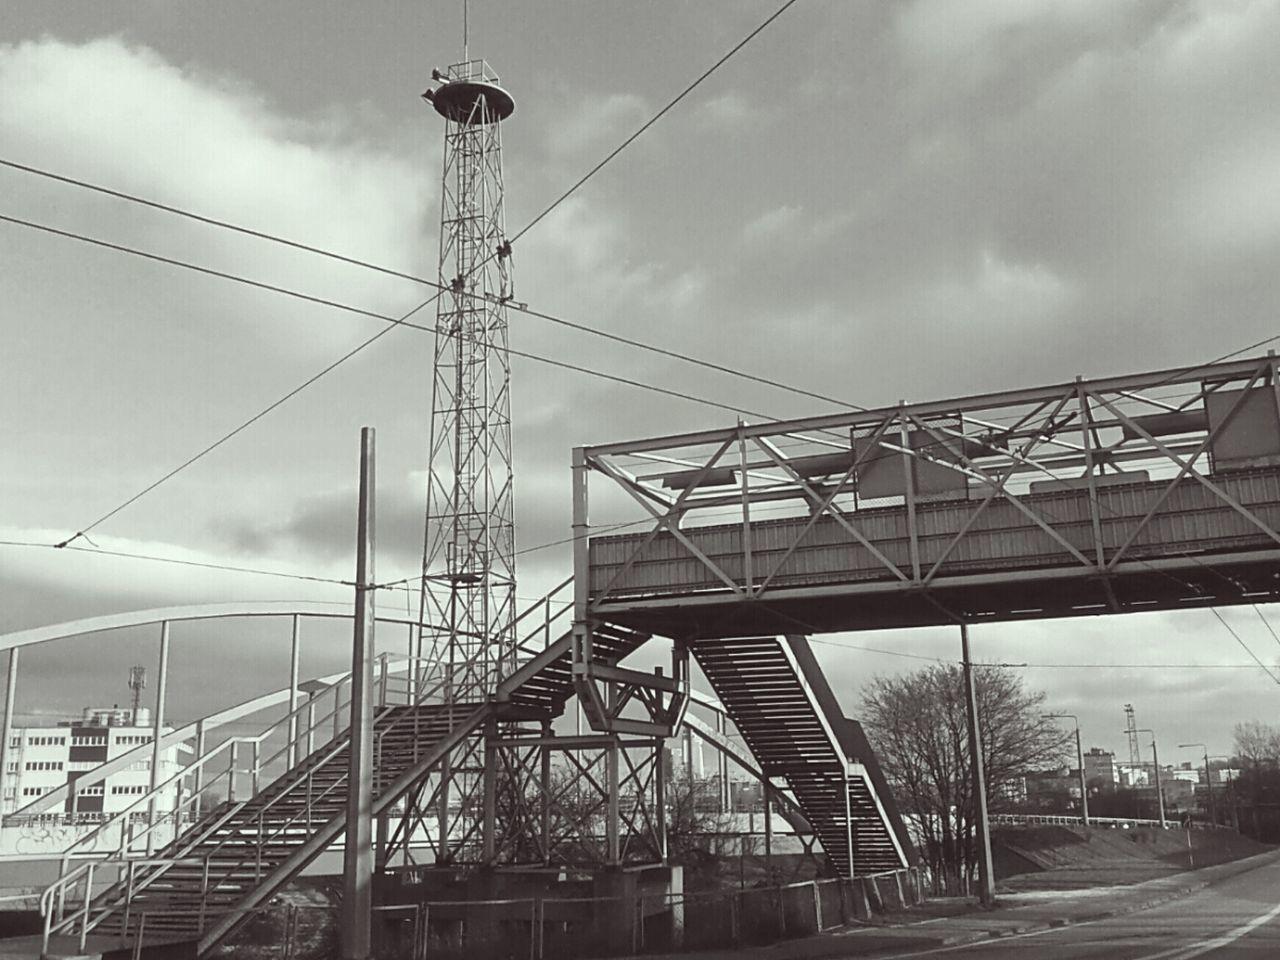 Low Angle View Of Pedestrian Walkway Bridge Against Cloudy Sky